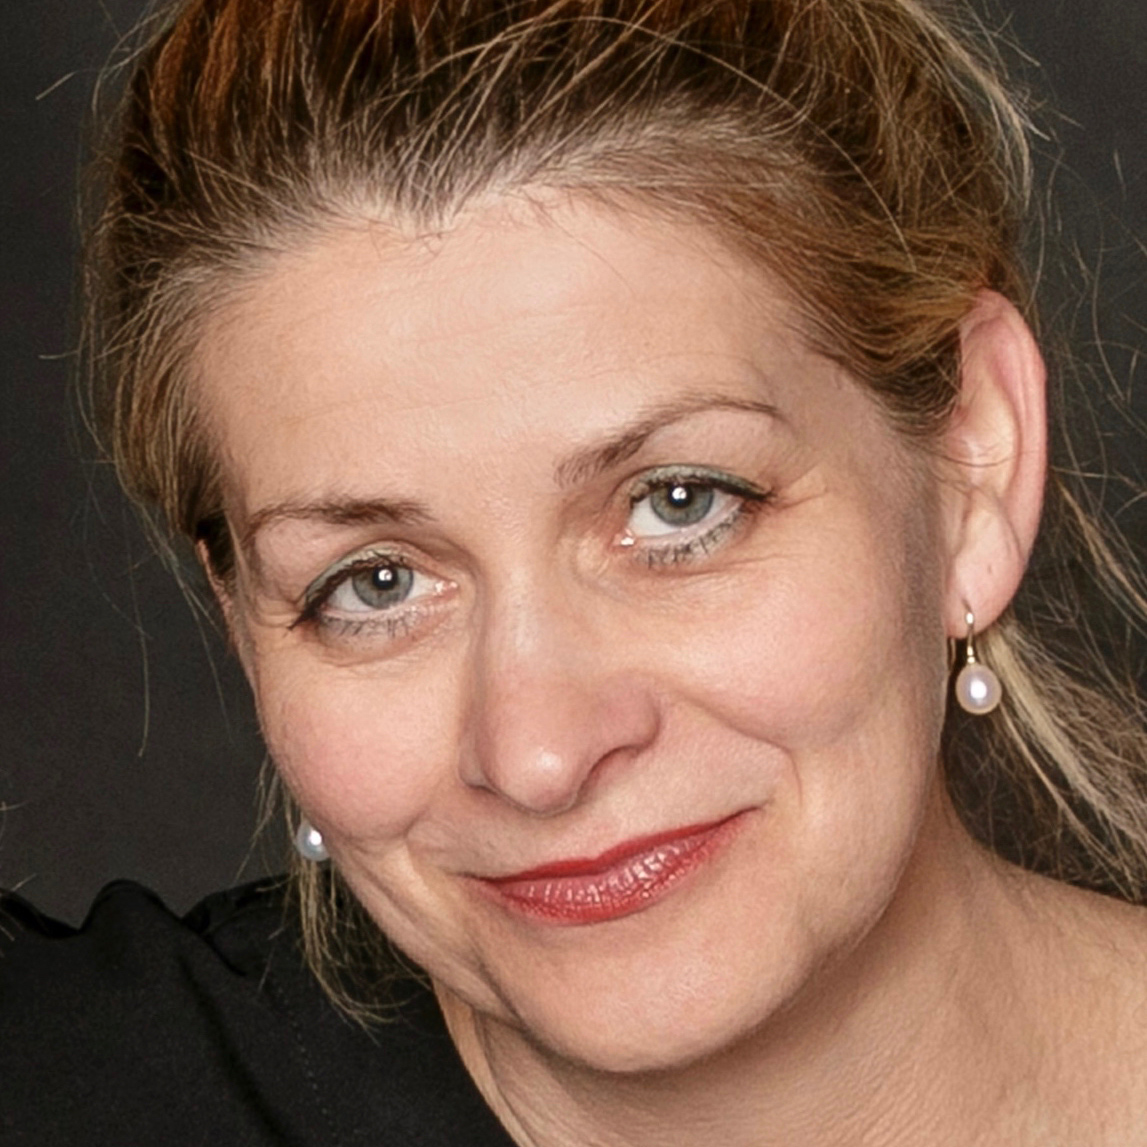 Musiktherapeutin Anna Fischer